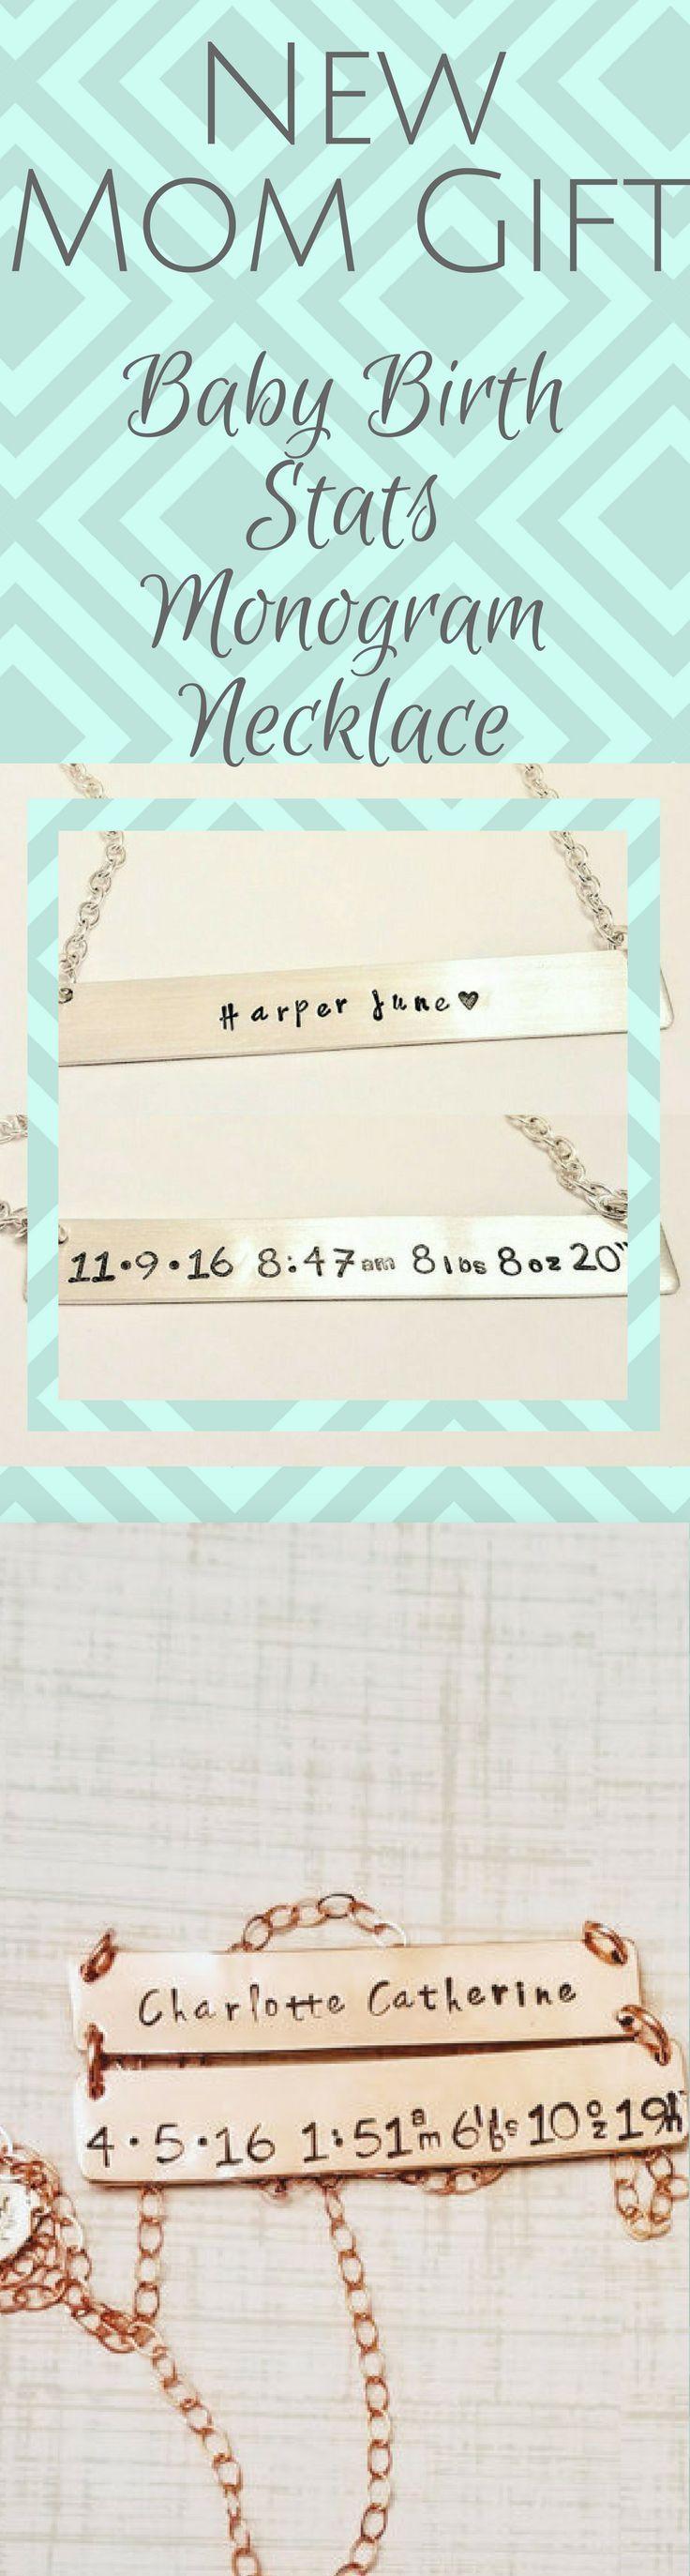 428 best Baby Shower Gift ideas images on Pinterest